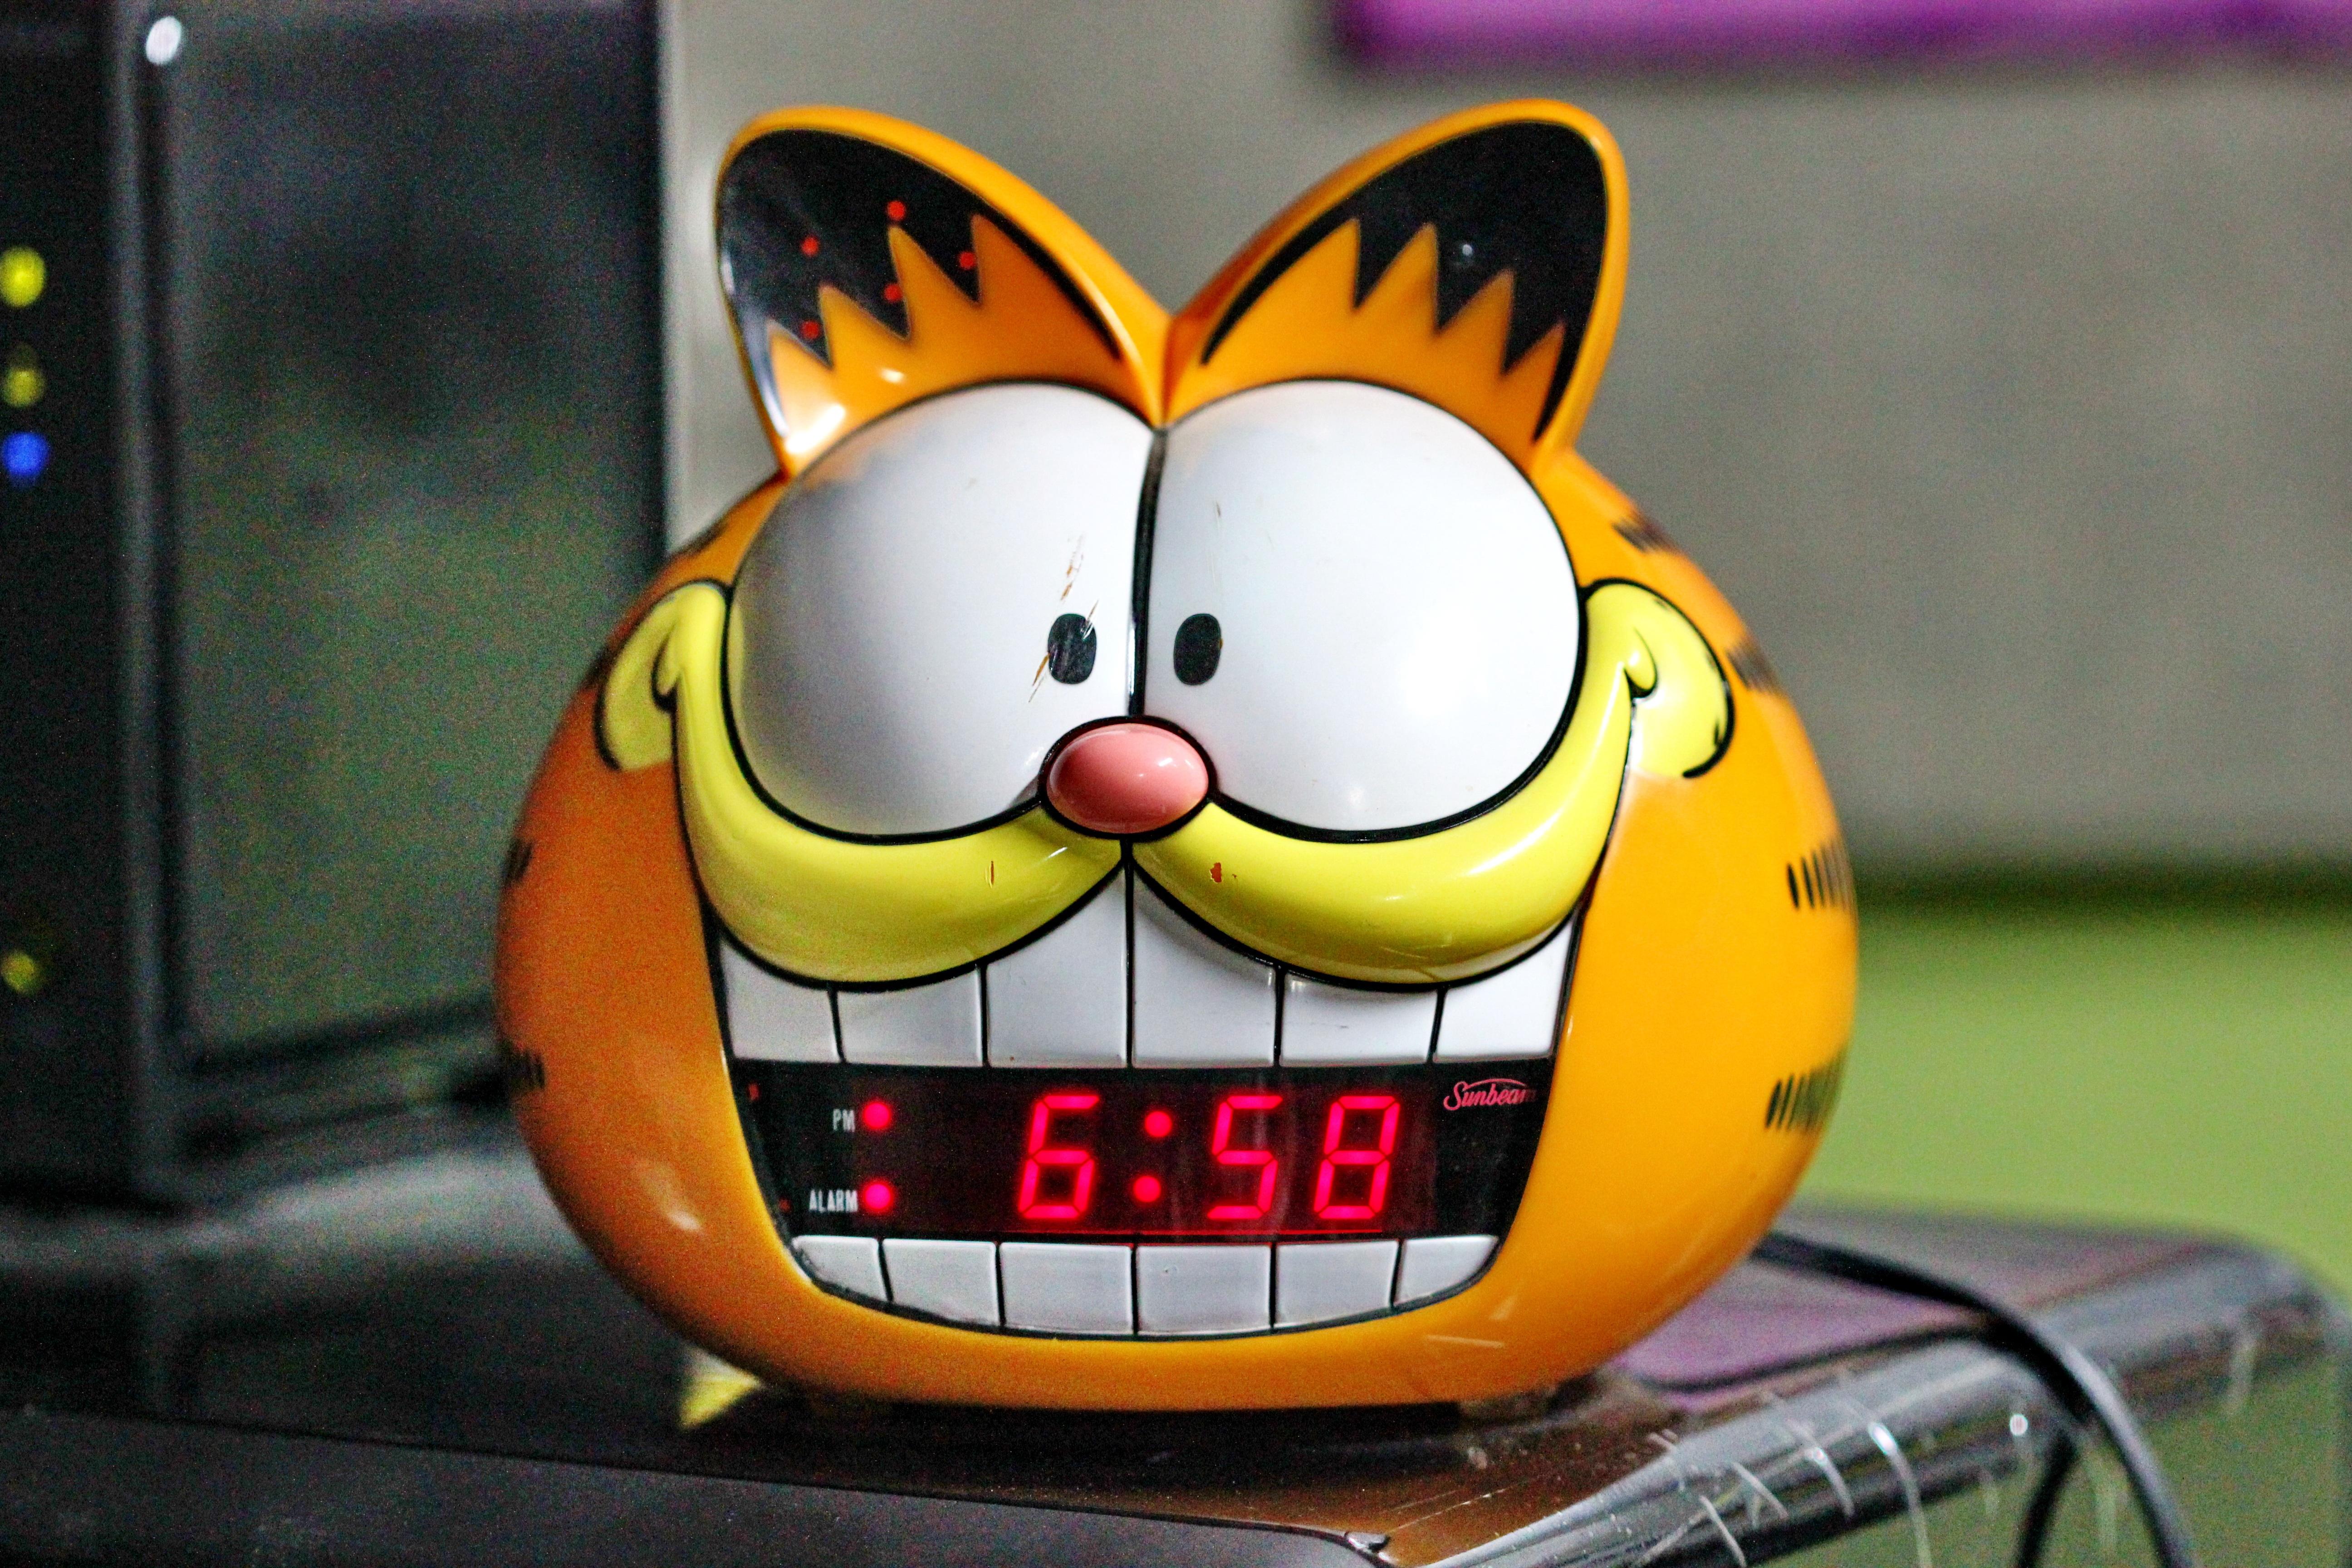 Gambar Pagi Jam Waktu Imut Alarm Makanan Kucing Kuning